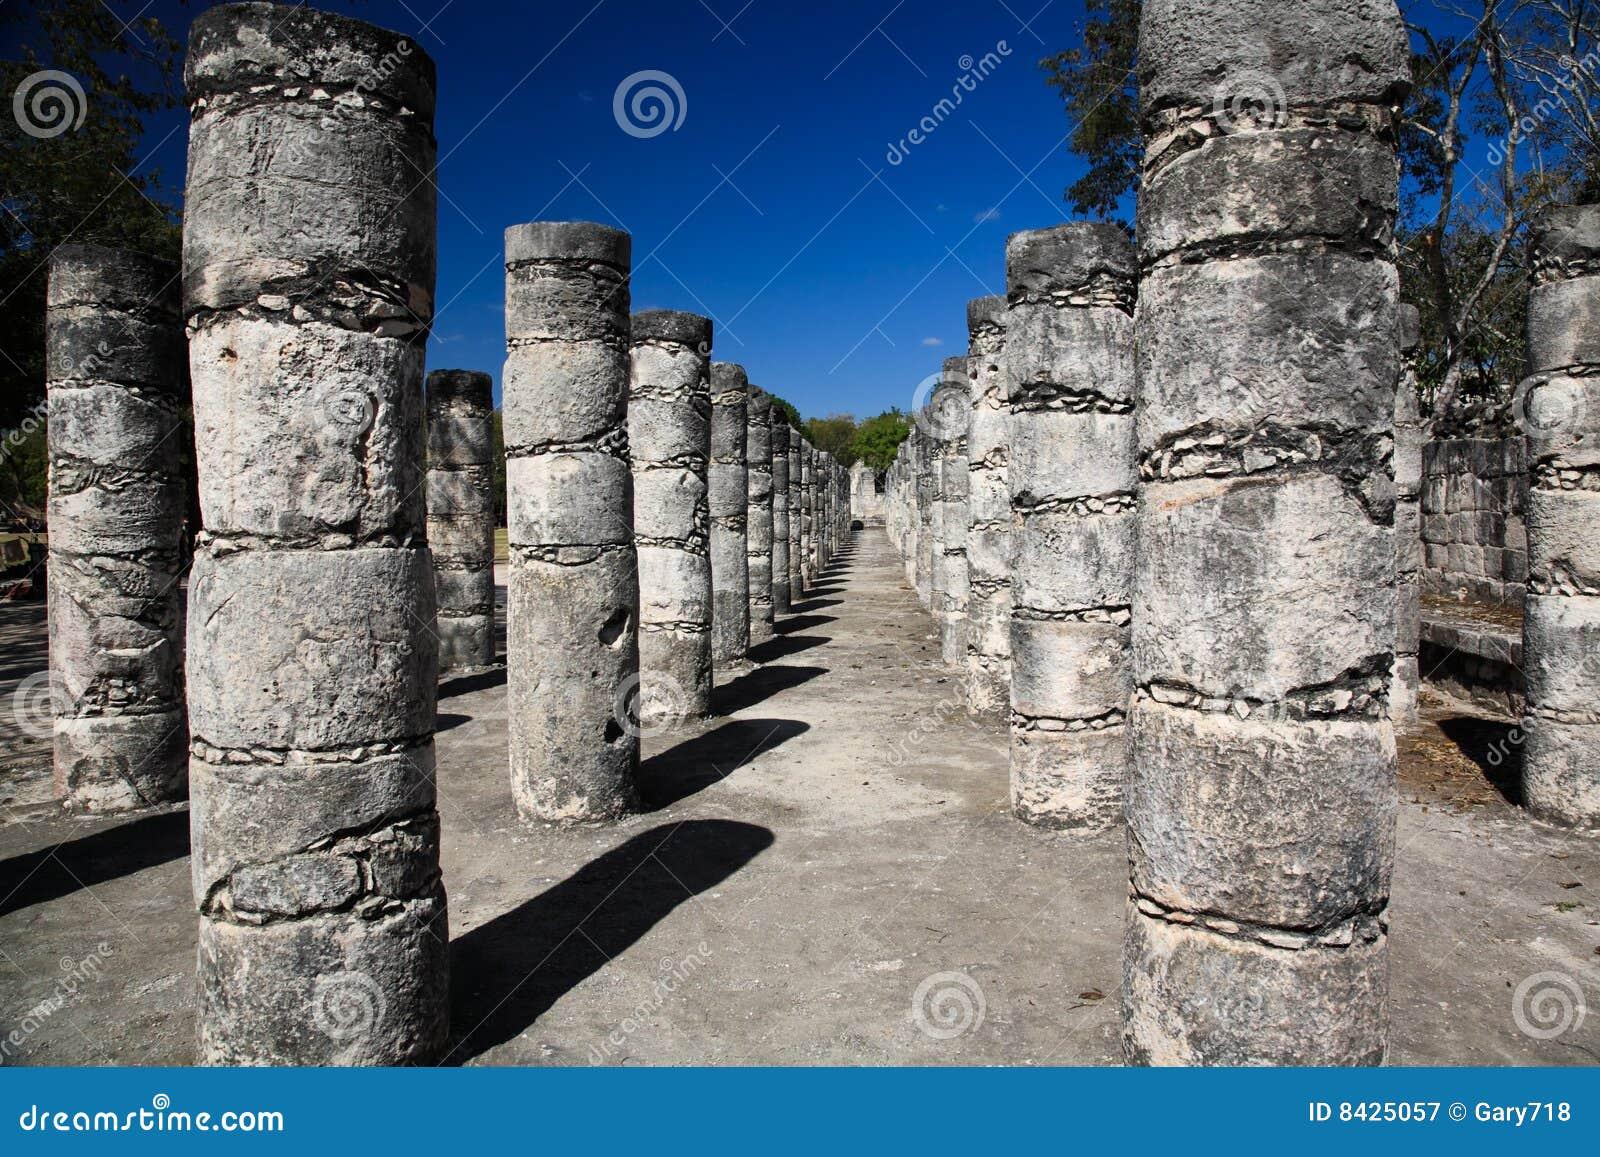 The temples of chichen itza temple